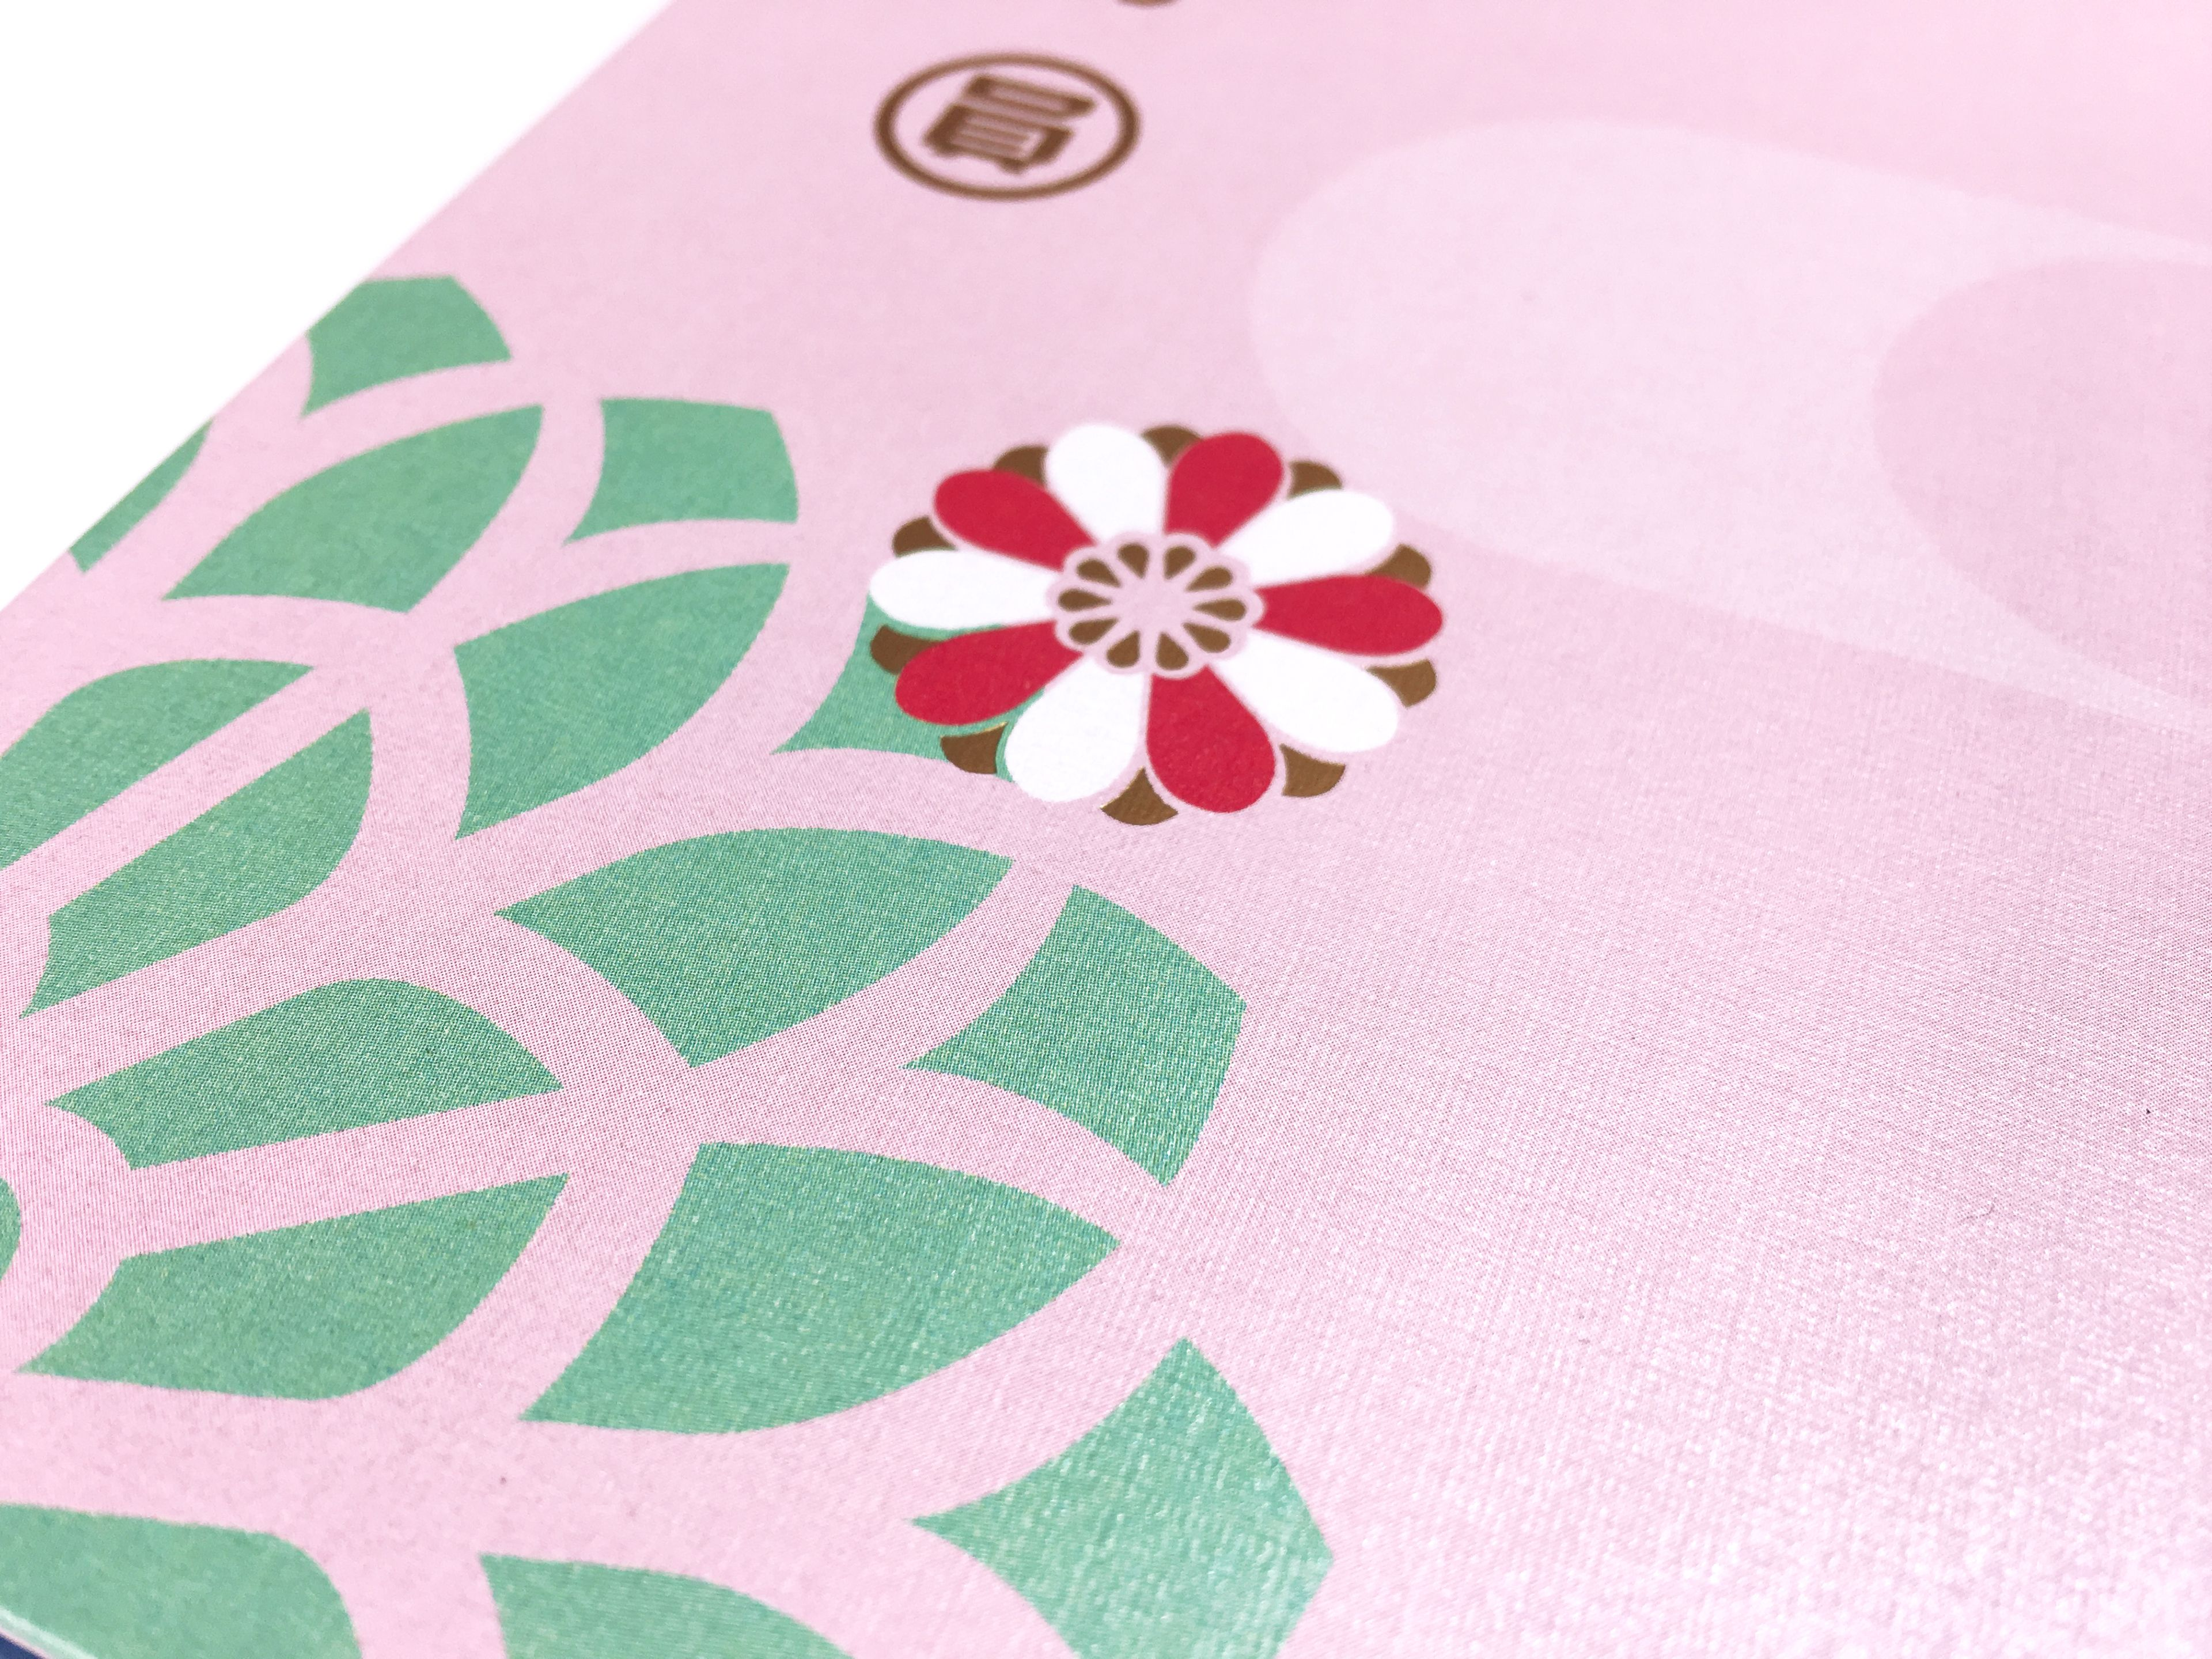 Blooming lotus designs women s - The Mooncake Packaging Of Allianz Is Associated With Lotus Flower In Sleek Elegant Design Symbolizing Beauty The Blooming Lotus Flower Also Indicates The